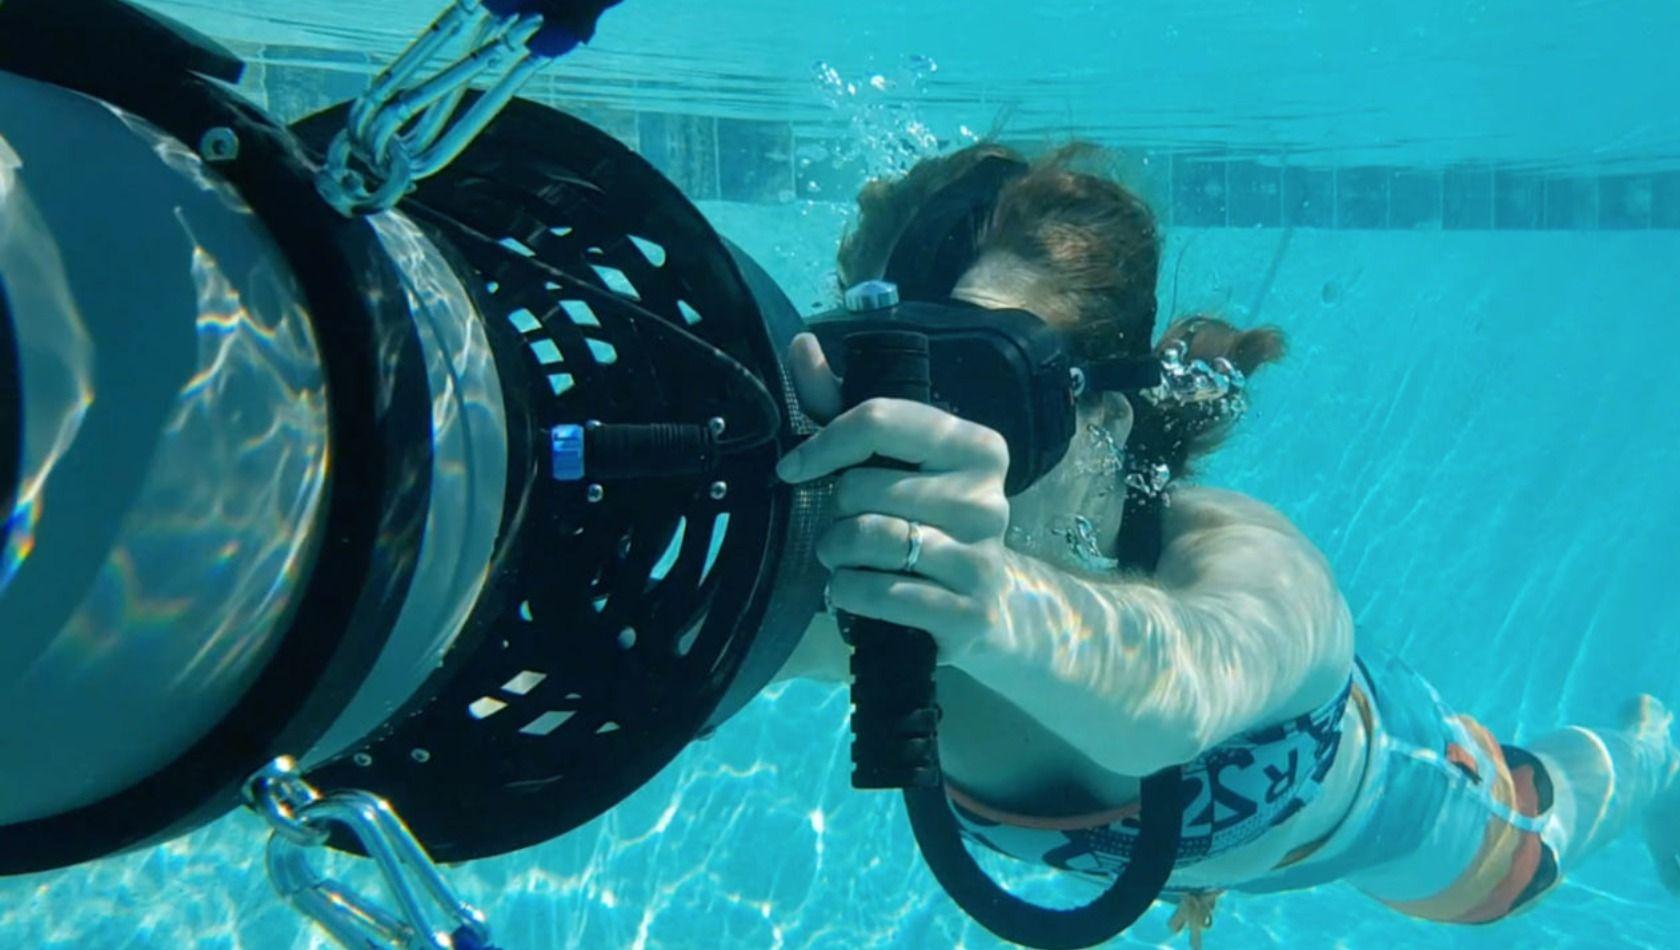 diving-theater-swimvr-vr-coaster-prototyp.jpg